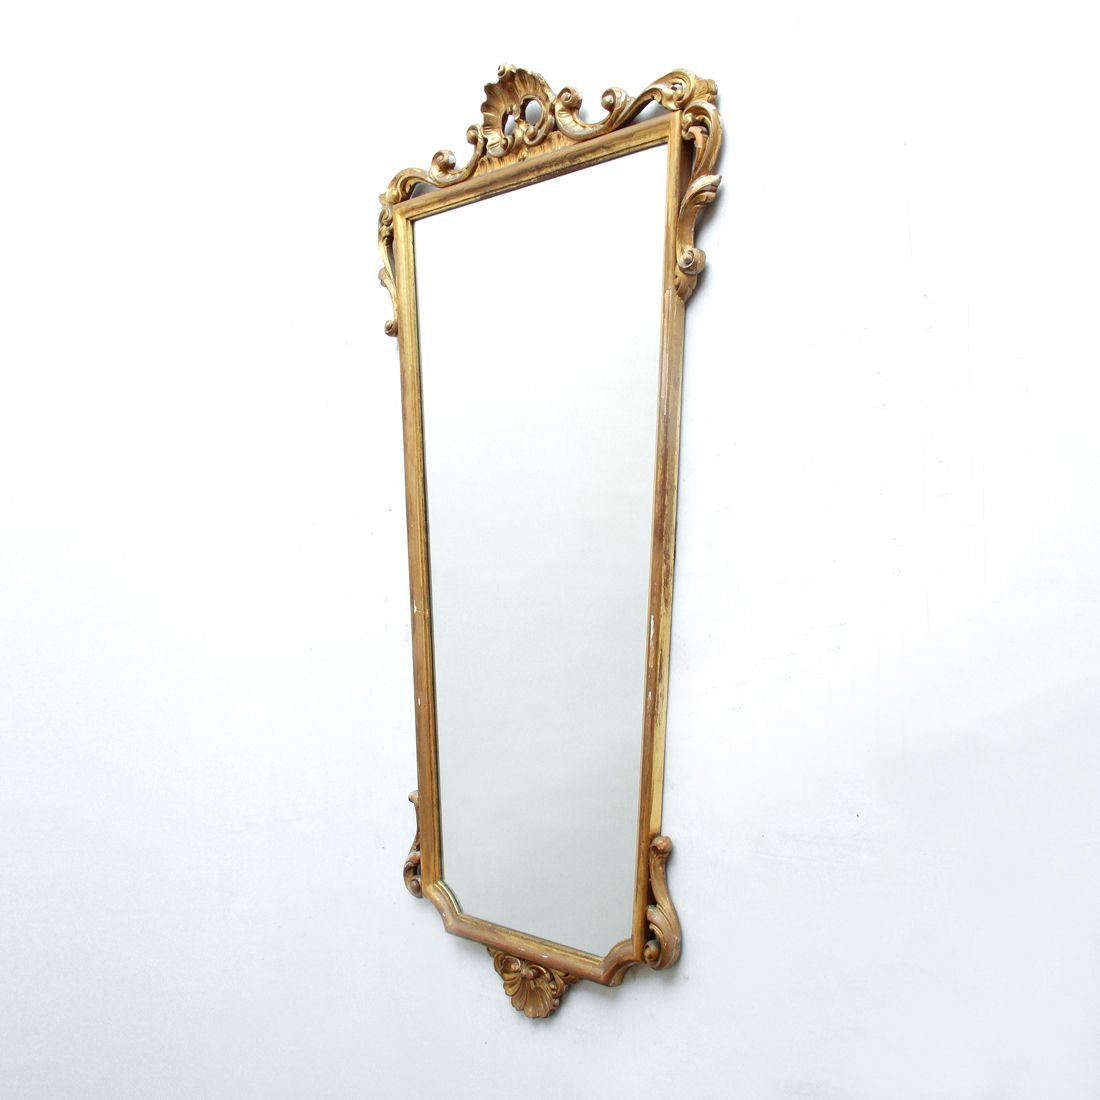 Grand miroir avec cadre dor italie 1940s en vente sur for Grand miroir solde